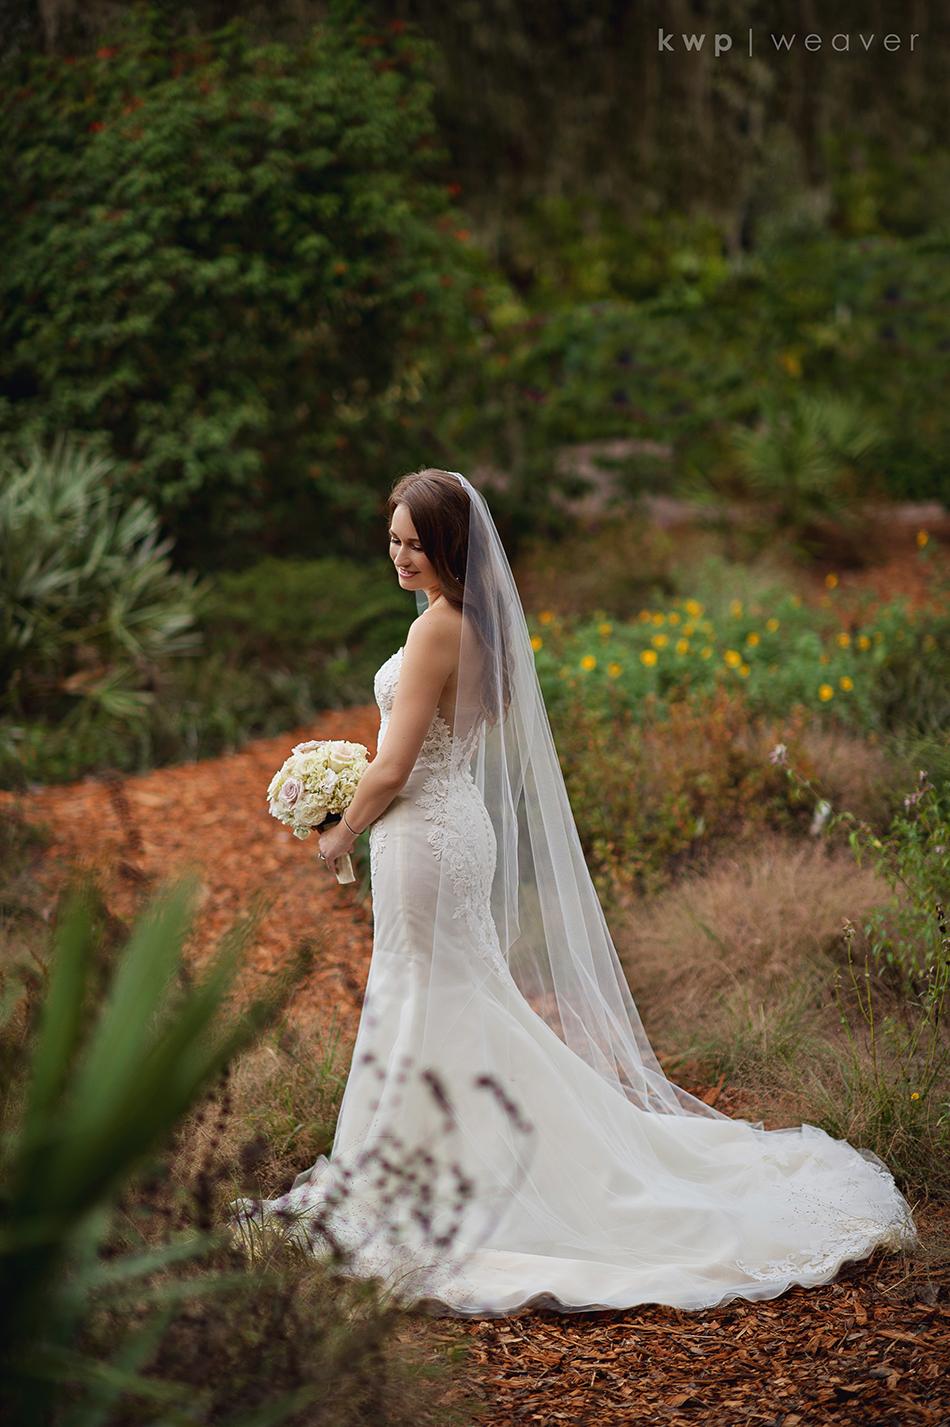 Orlando Bridal Portrait